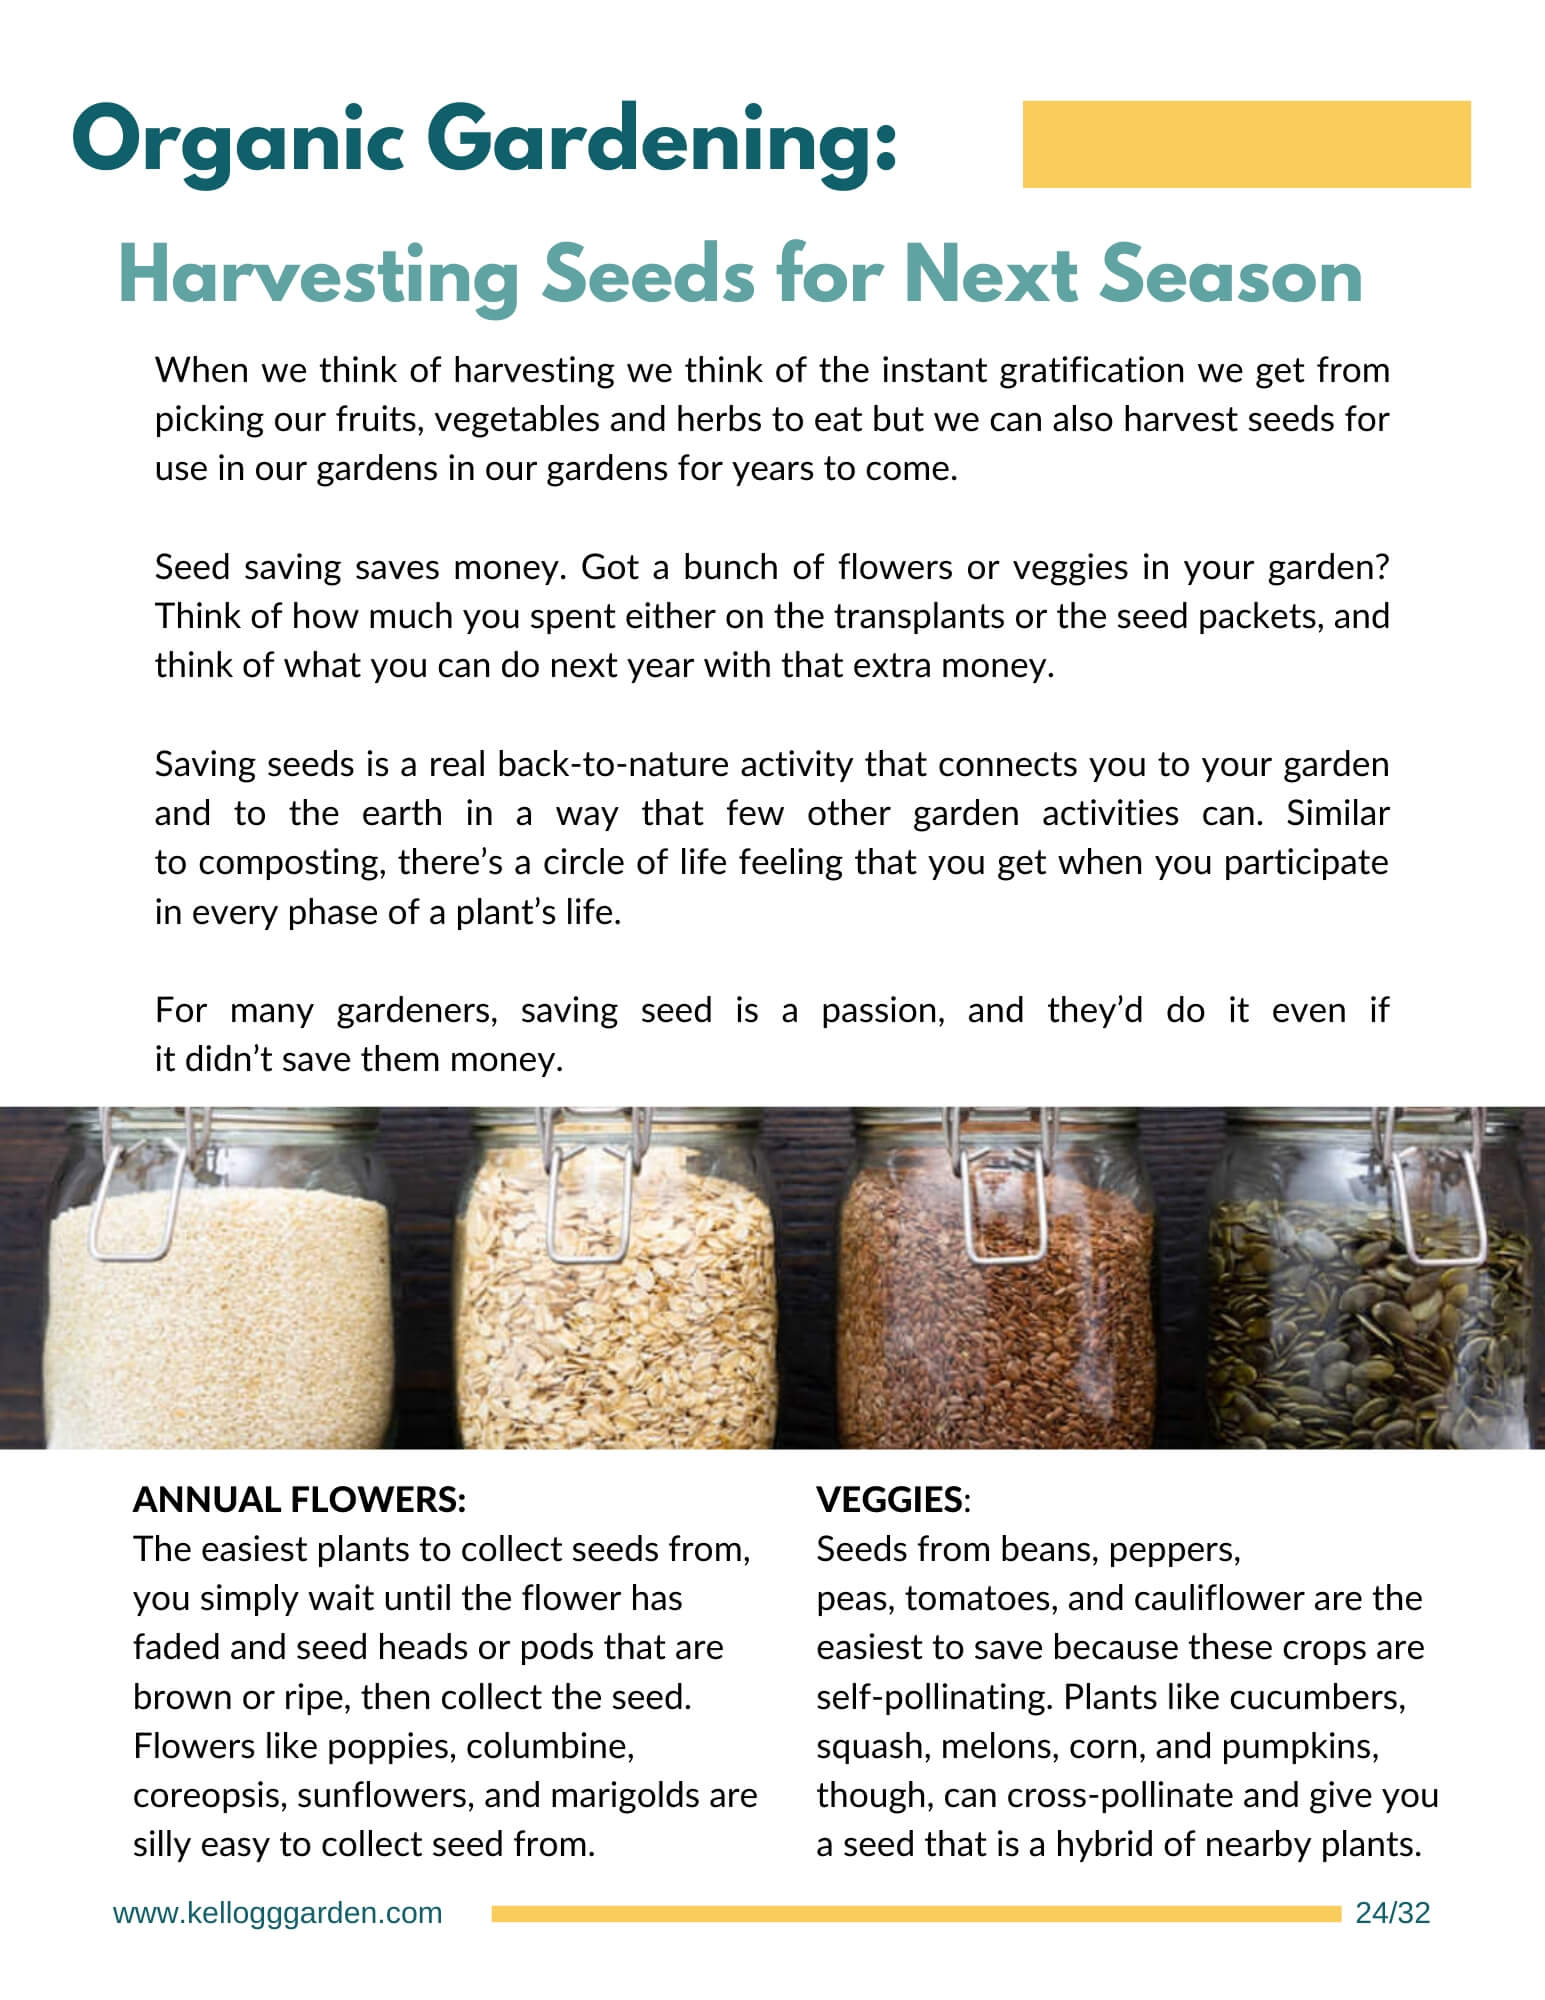 Harvesting guide page on saving seeds.